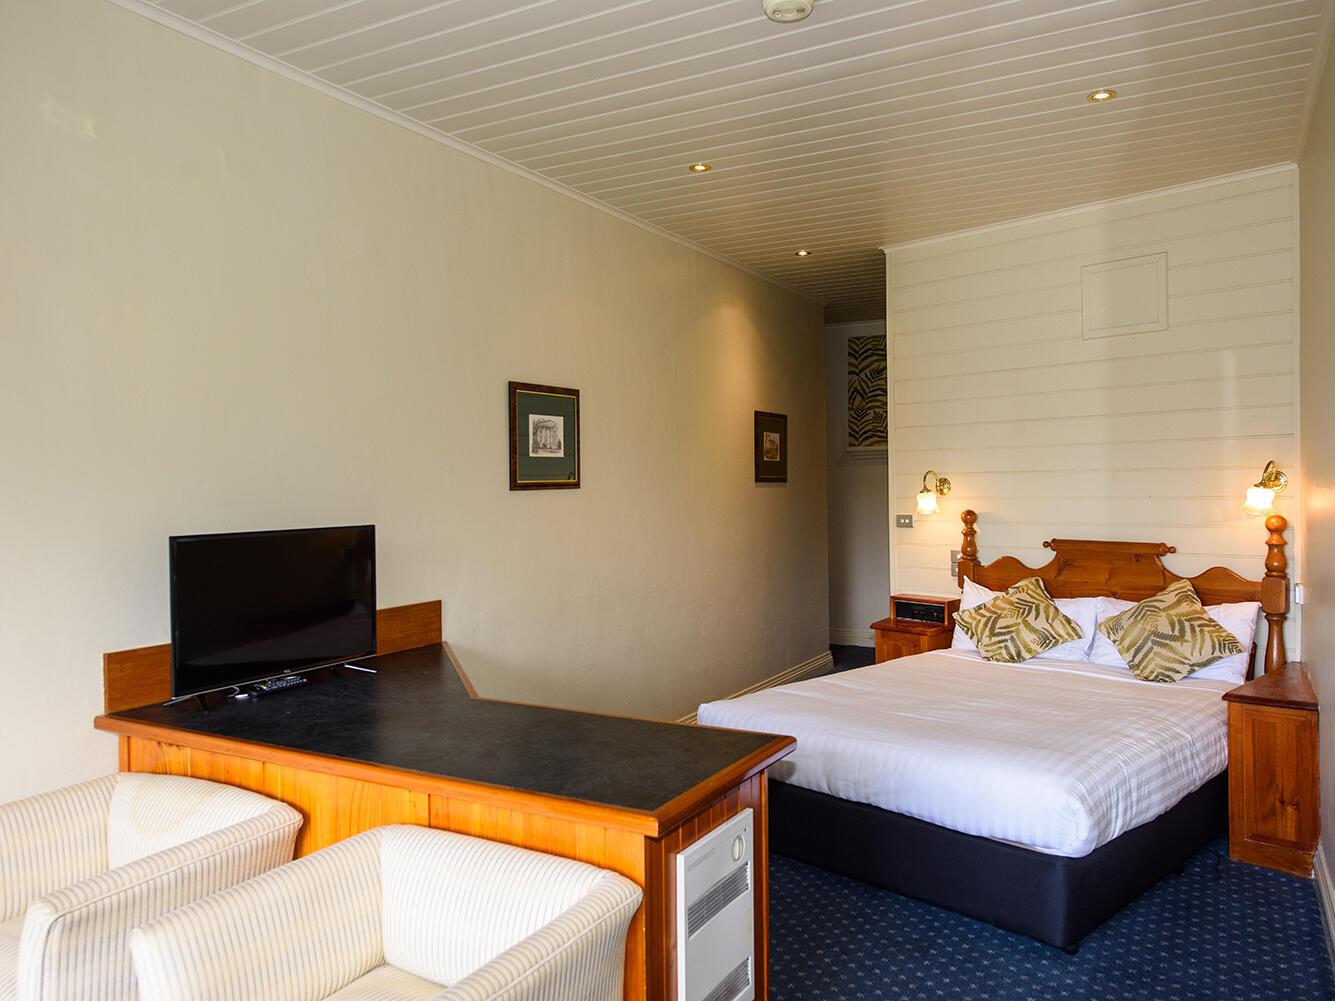 Village Waterfront Terrace Room in Strahan Village